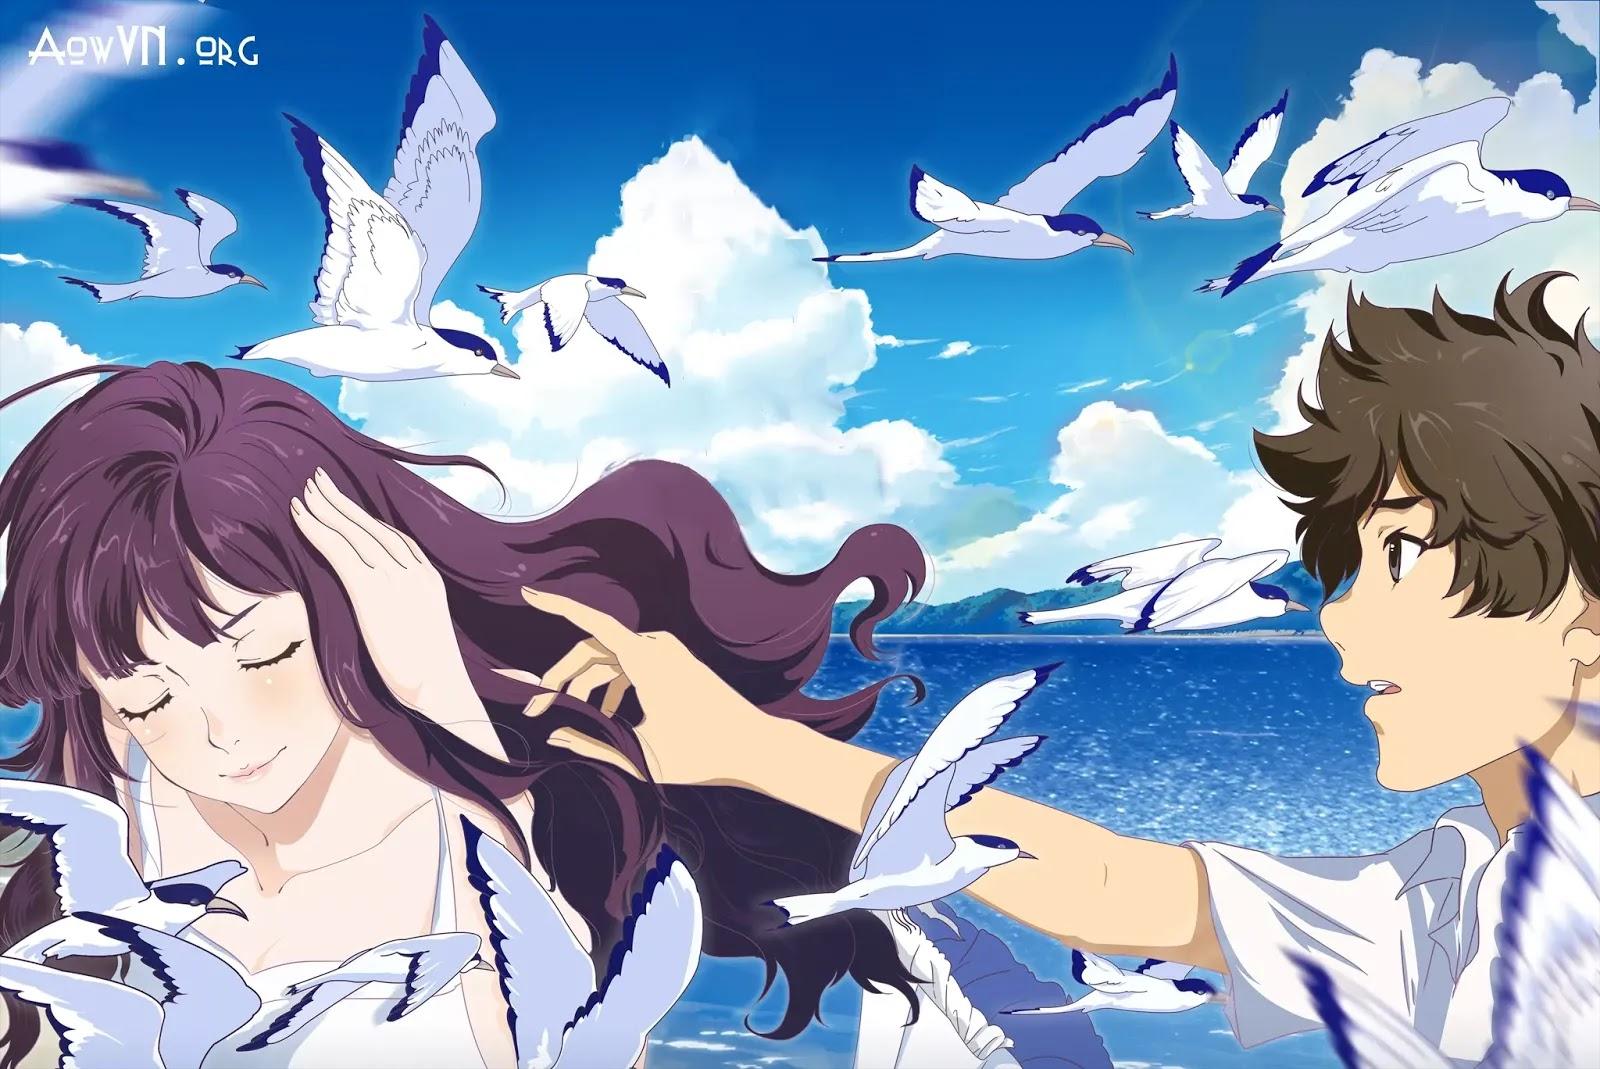 AowVN.org minz%2B%25286%2529 - [ Hình Nền ] Anime Uchiage Hanabi Shita Kara Miru Ka cực đẹp | AowVN Wallpapers